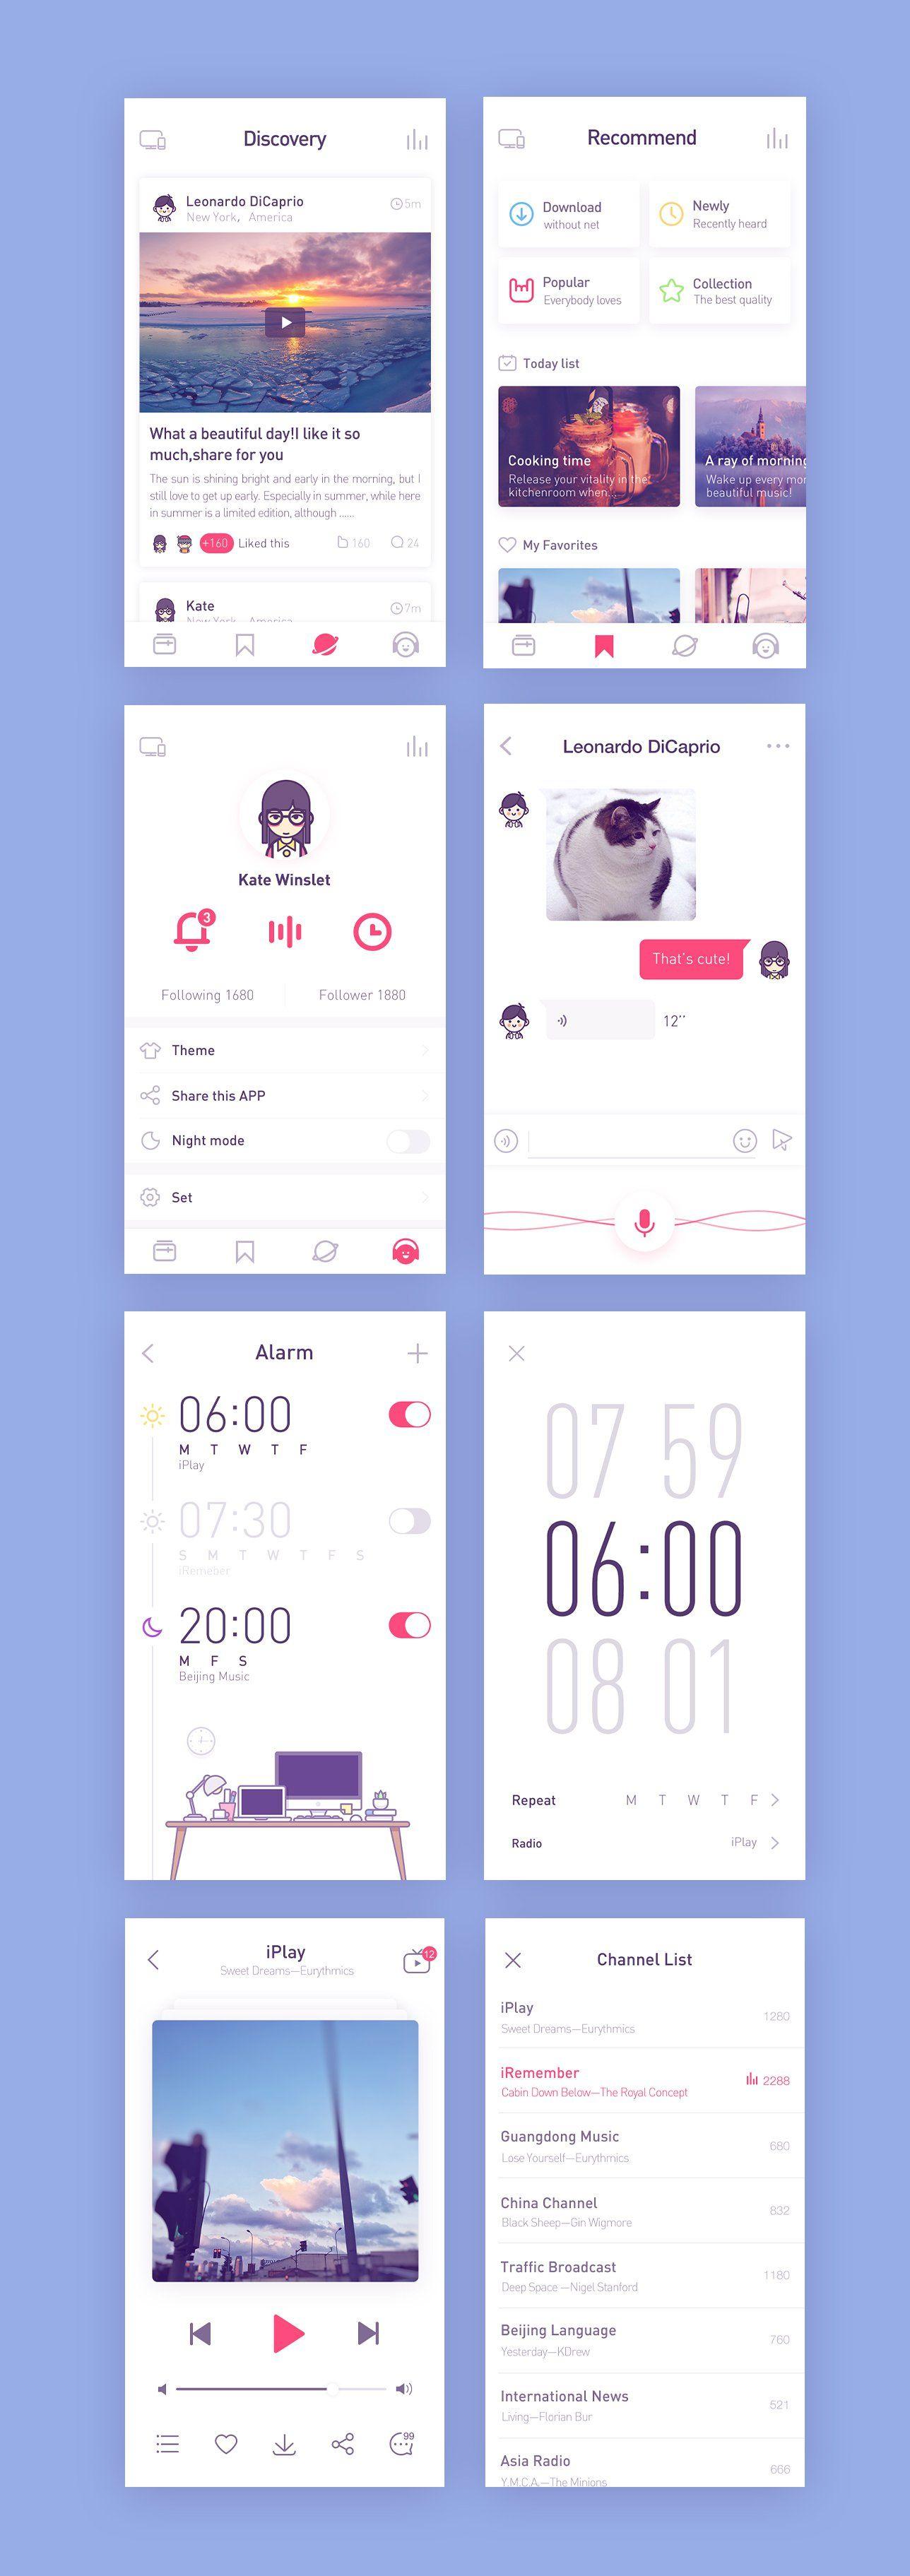 Radio app – User interface by Rwds